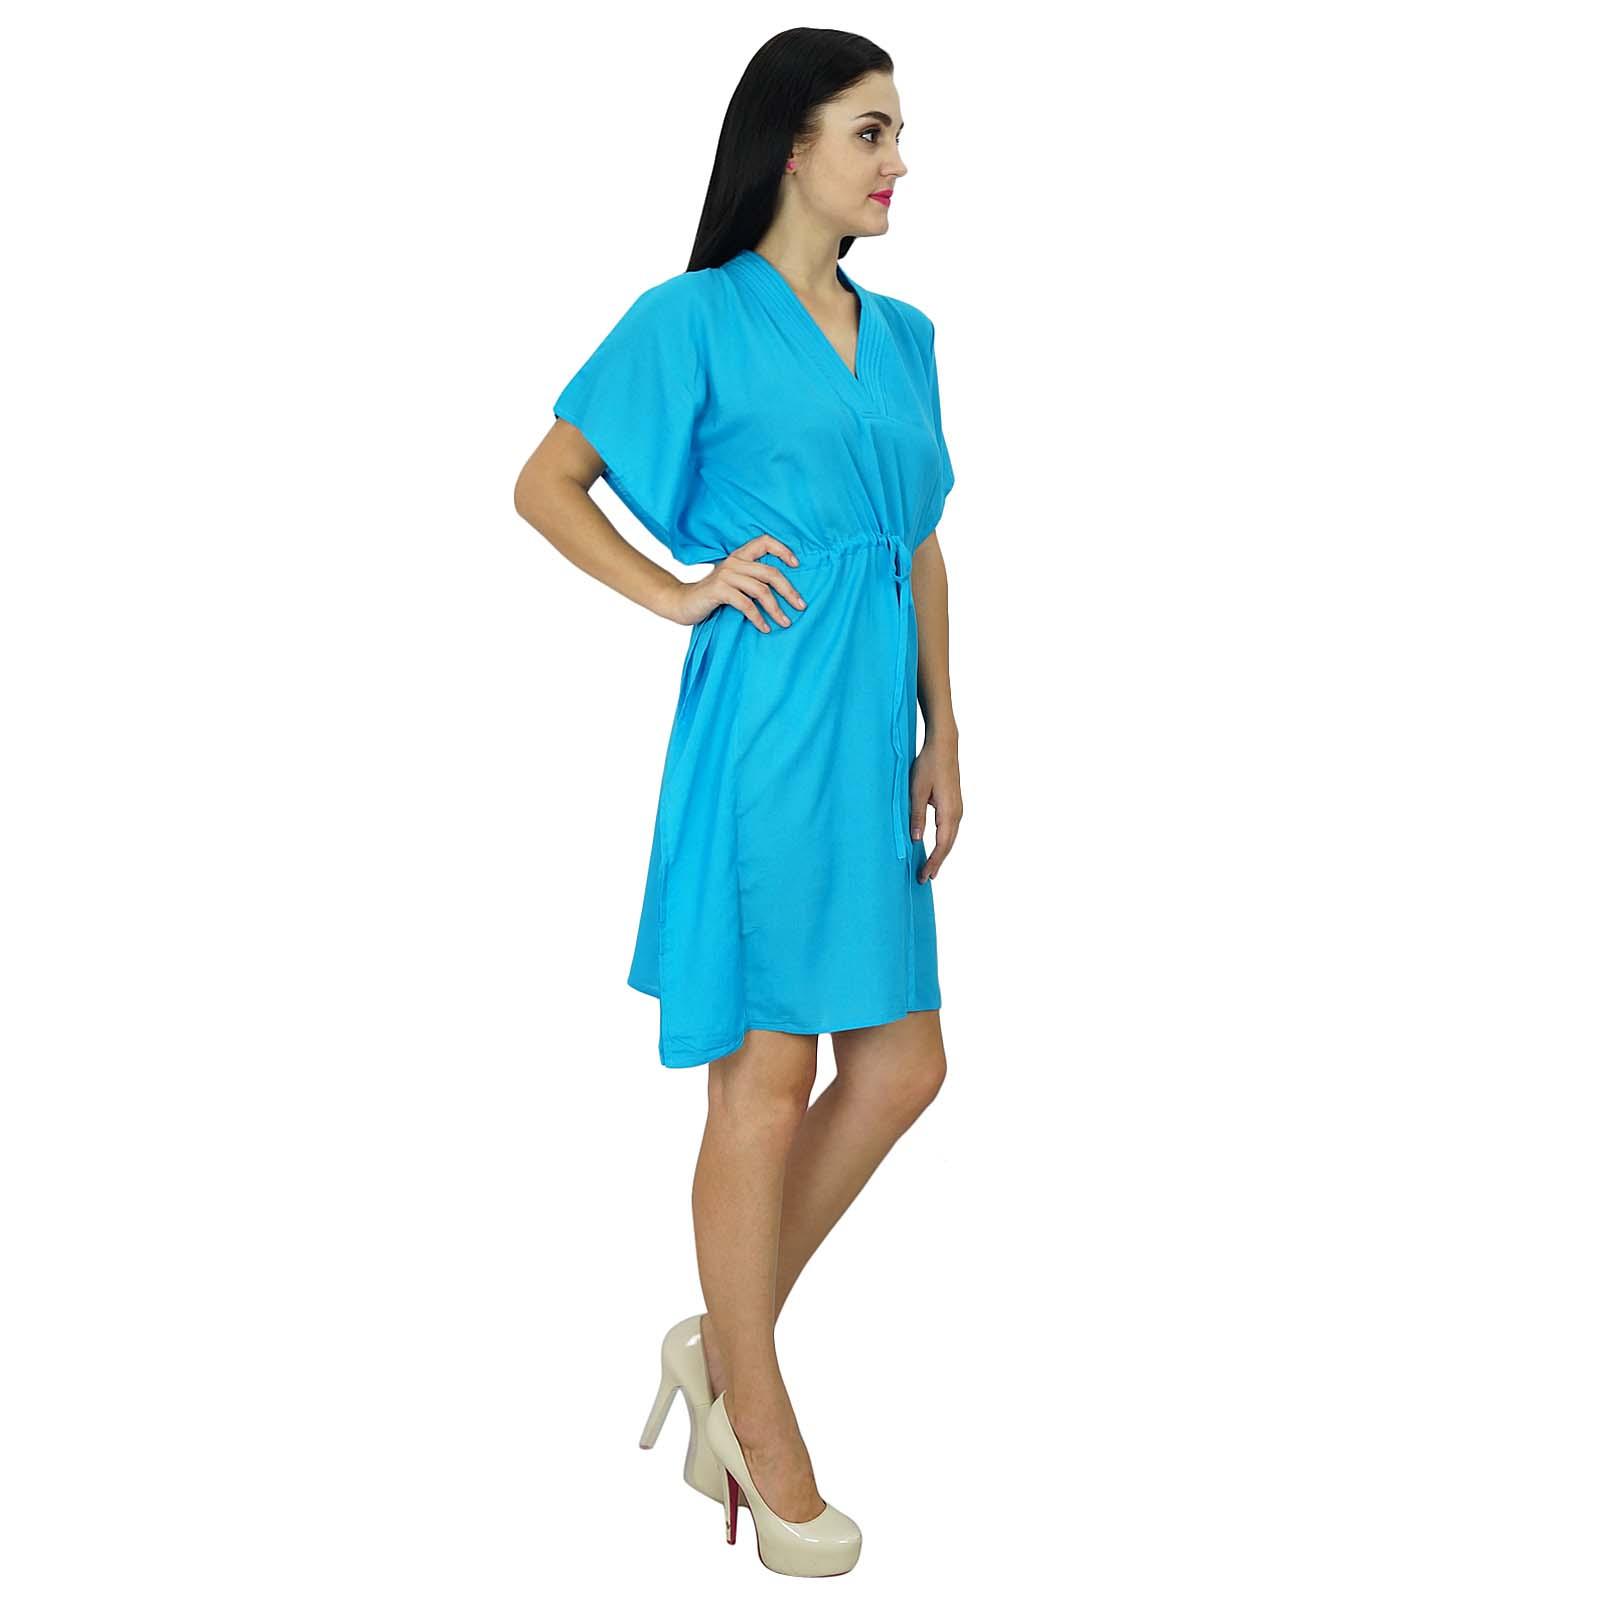 thumbnail 5 - Bimba Women Plain Kaftan Dress Beach Cover Up Cotton Solid Caftan-58z